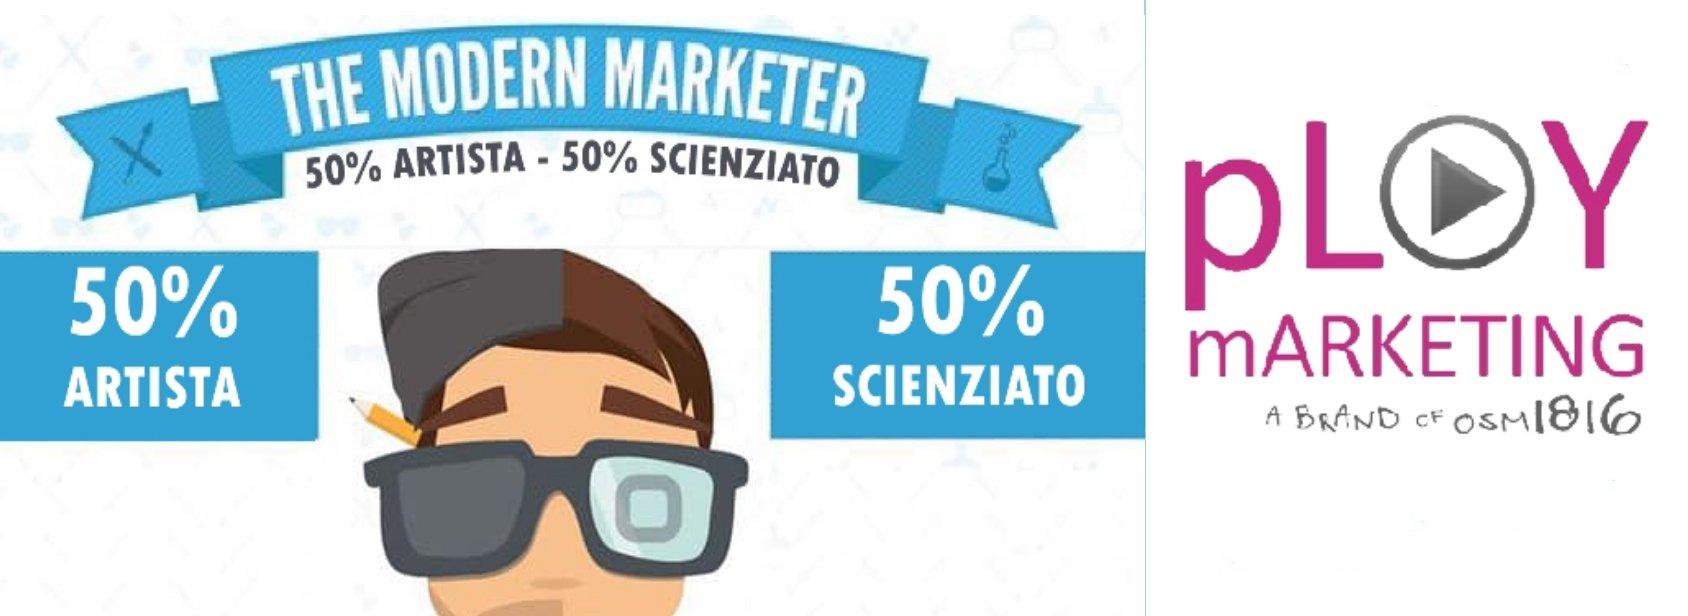 Infografica: Il marketer moderno